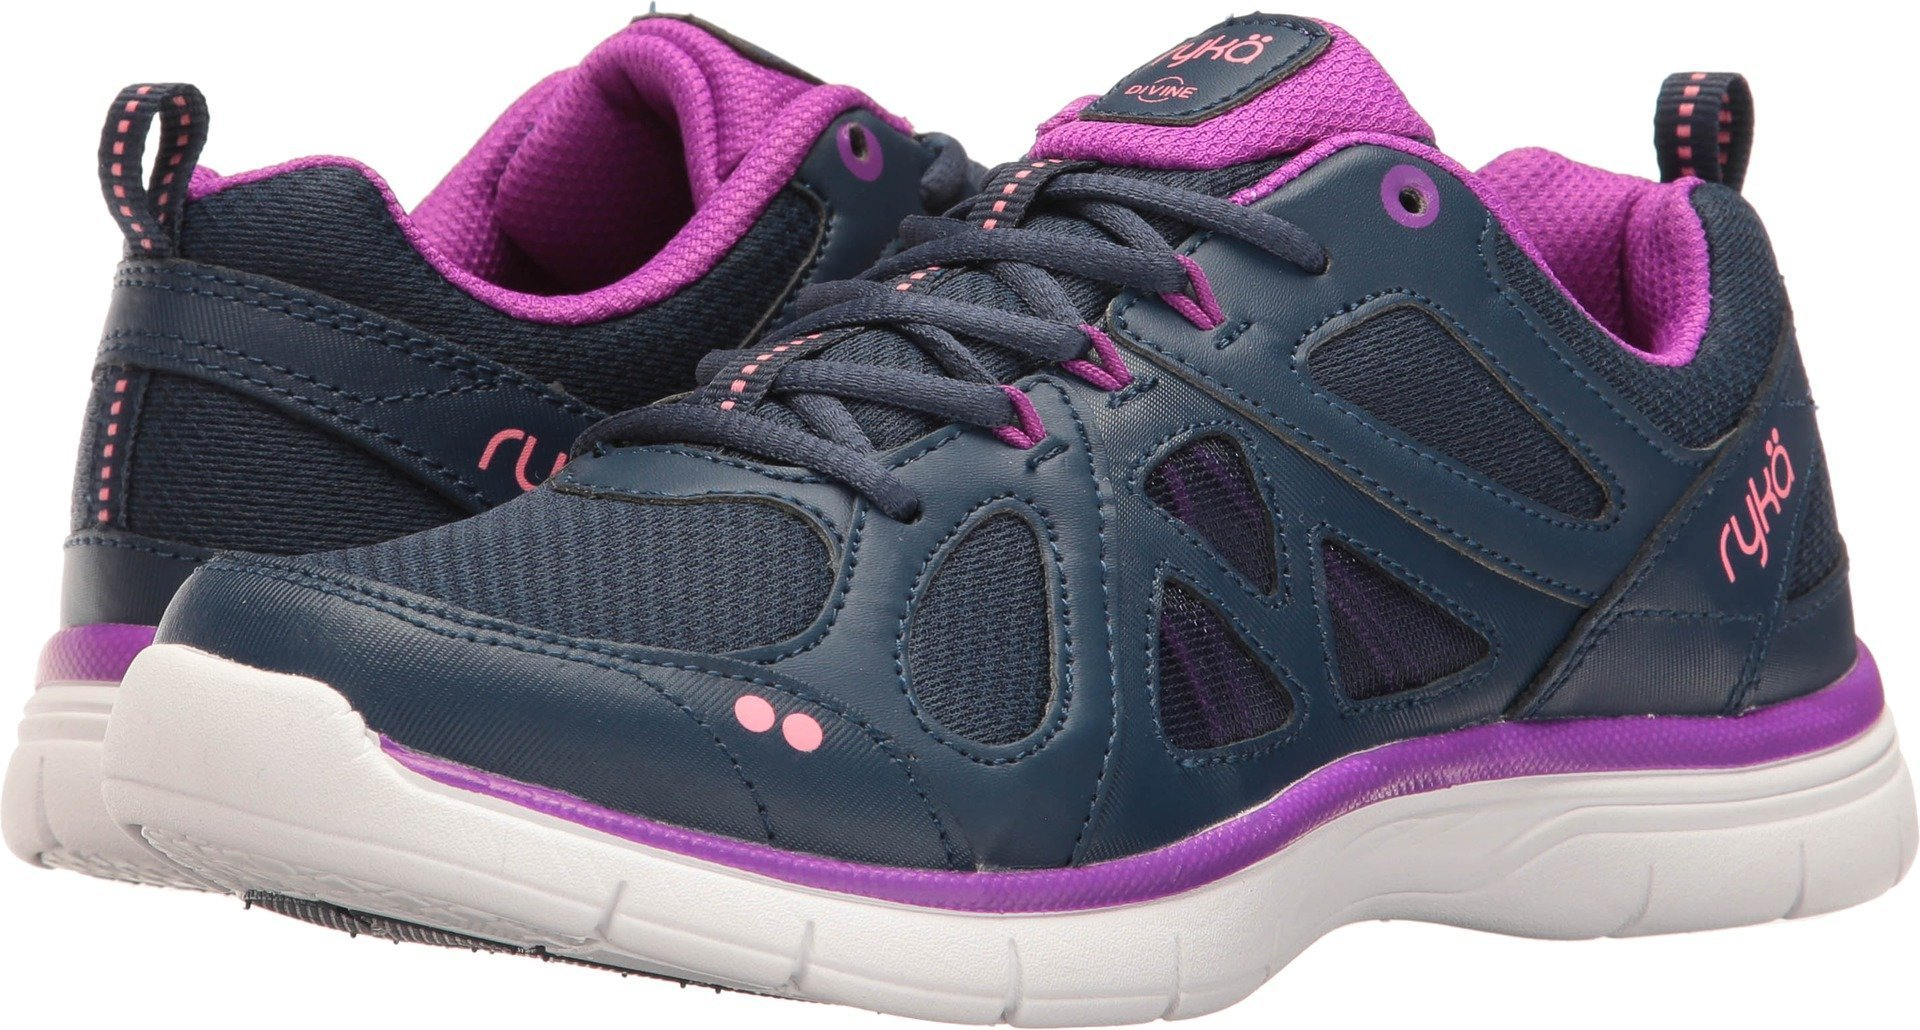 Ryka Women's Divine Training Shoe,Insignia Blue/Vivid Berry/Calypso Coral,US 7.5